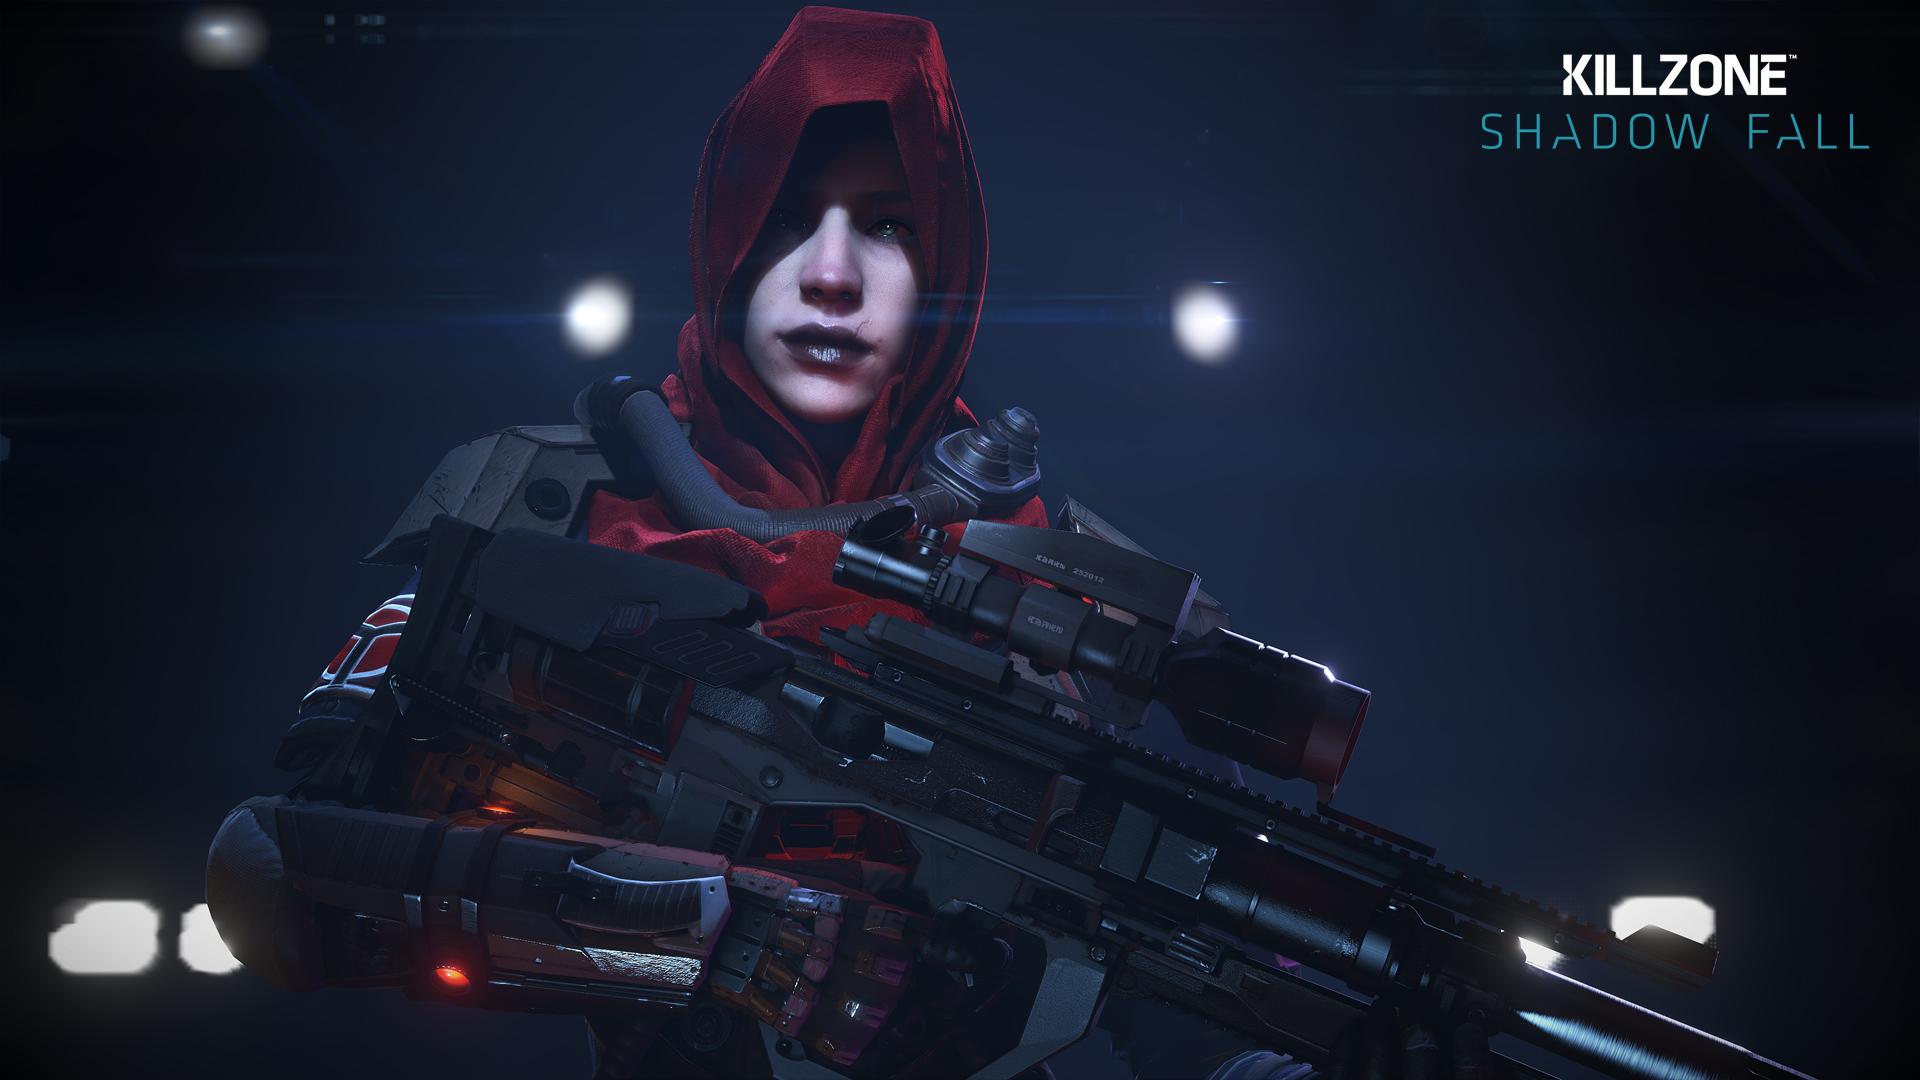 Killzone-ShadowFall PS4 Div 004